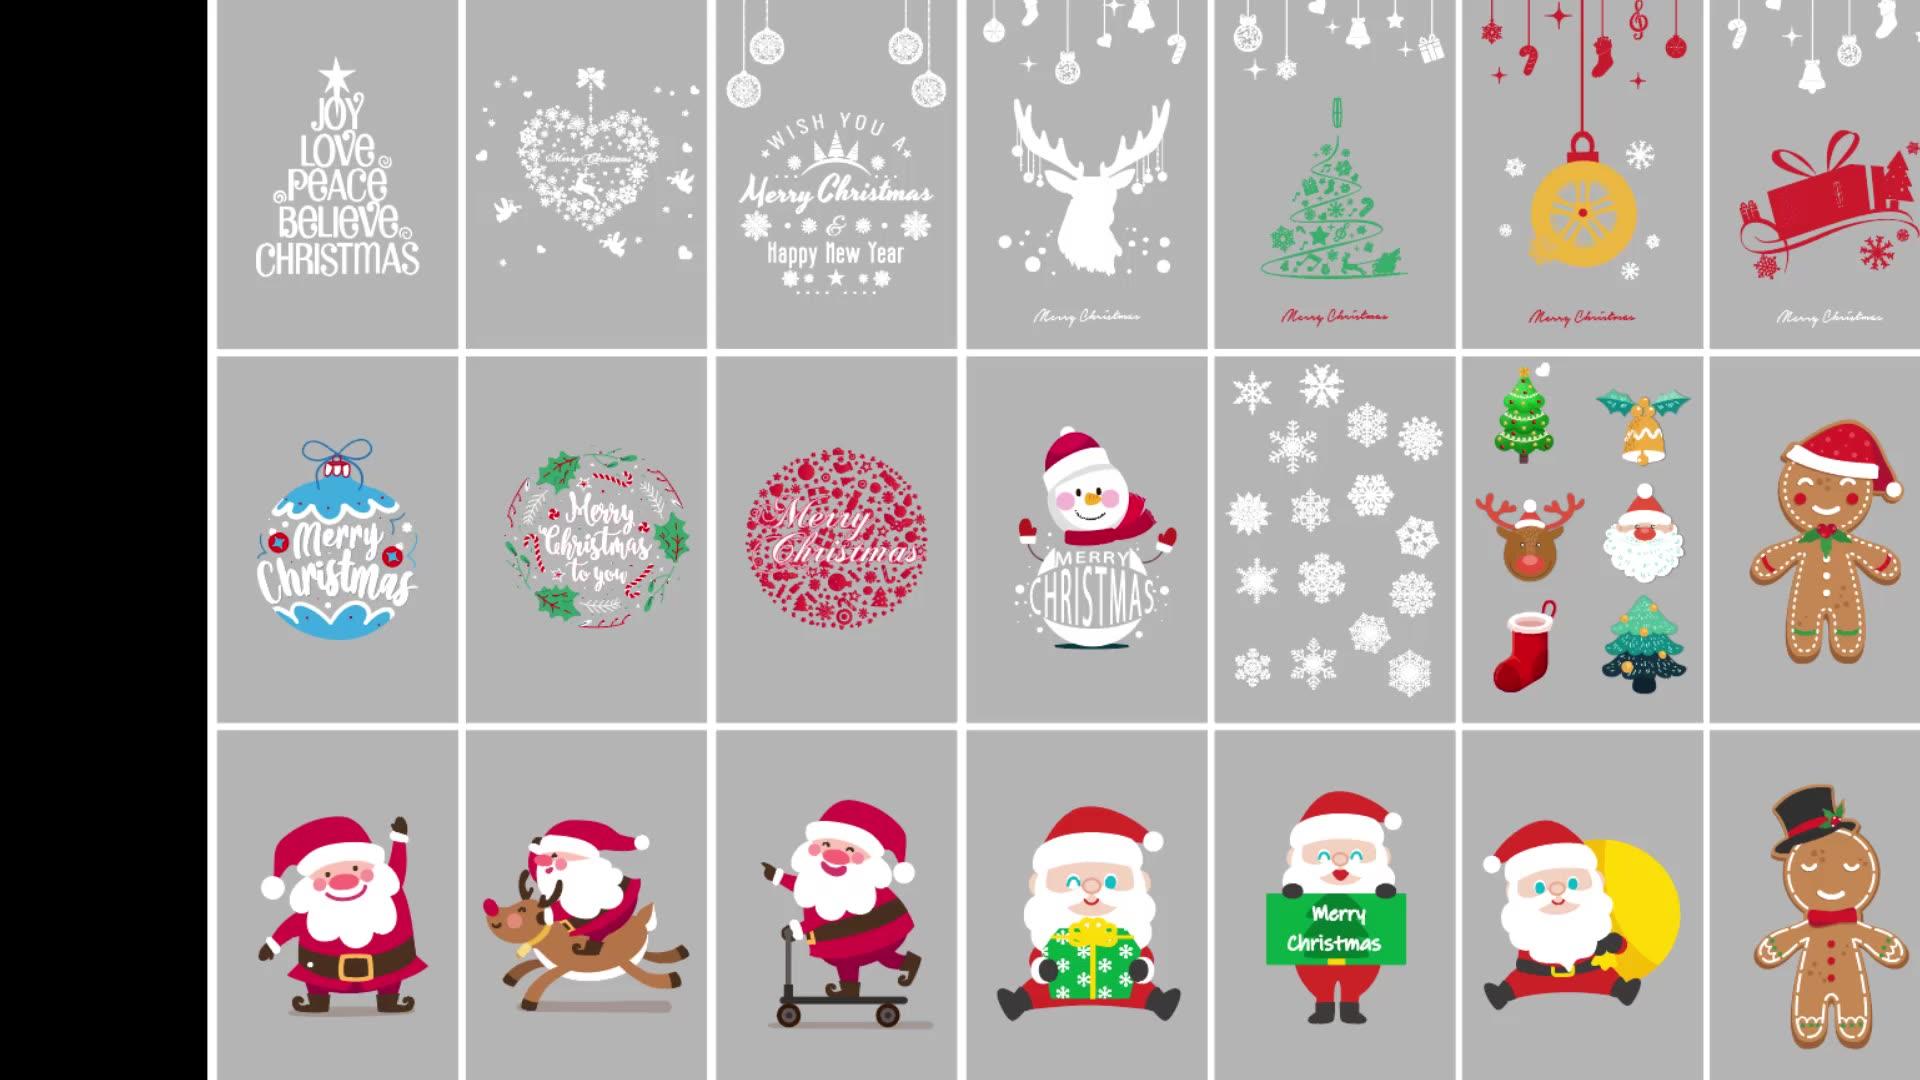 2020 Waterproof Adhesive Vinyl Christmas Sticker For Window Decoration